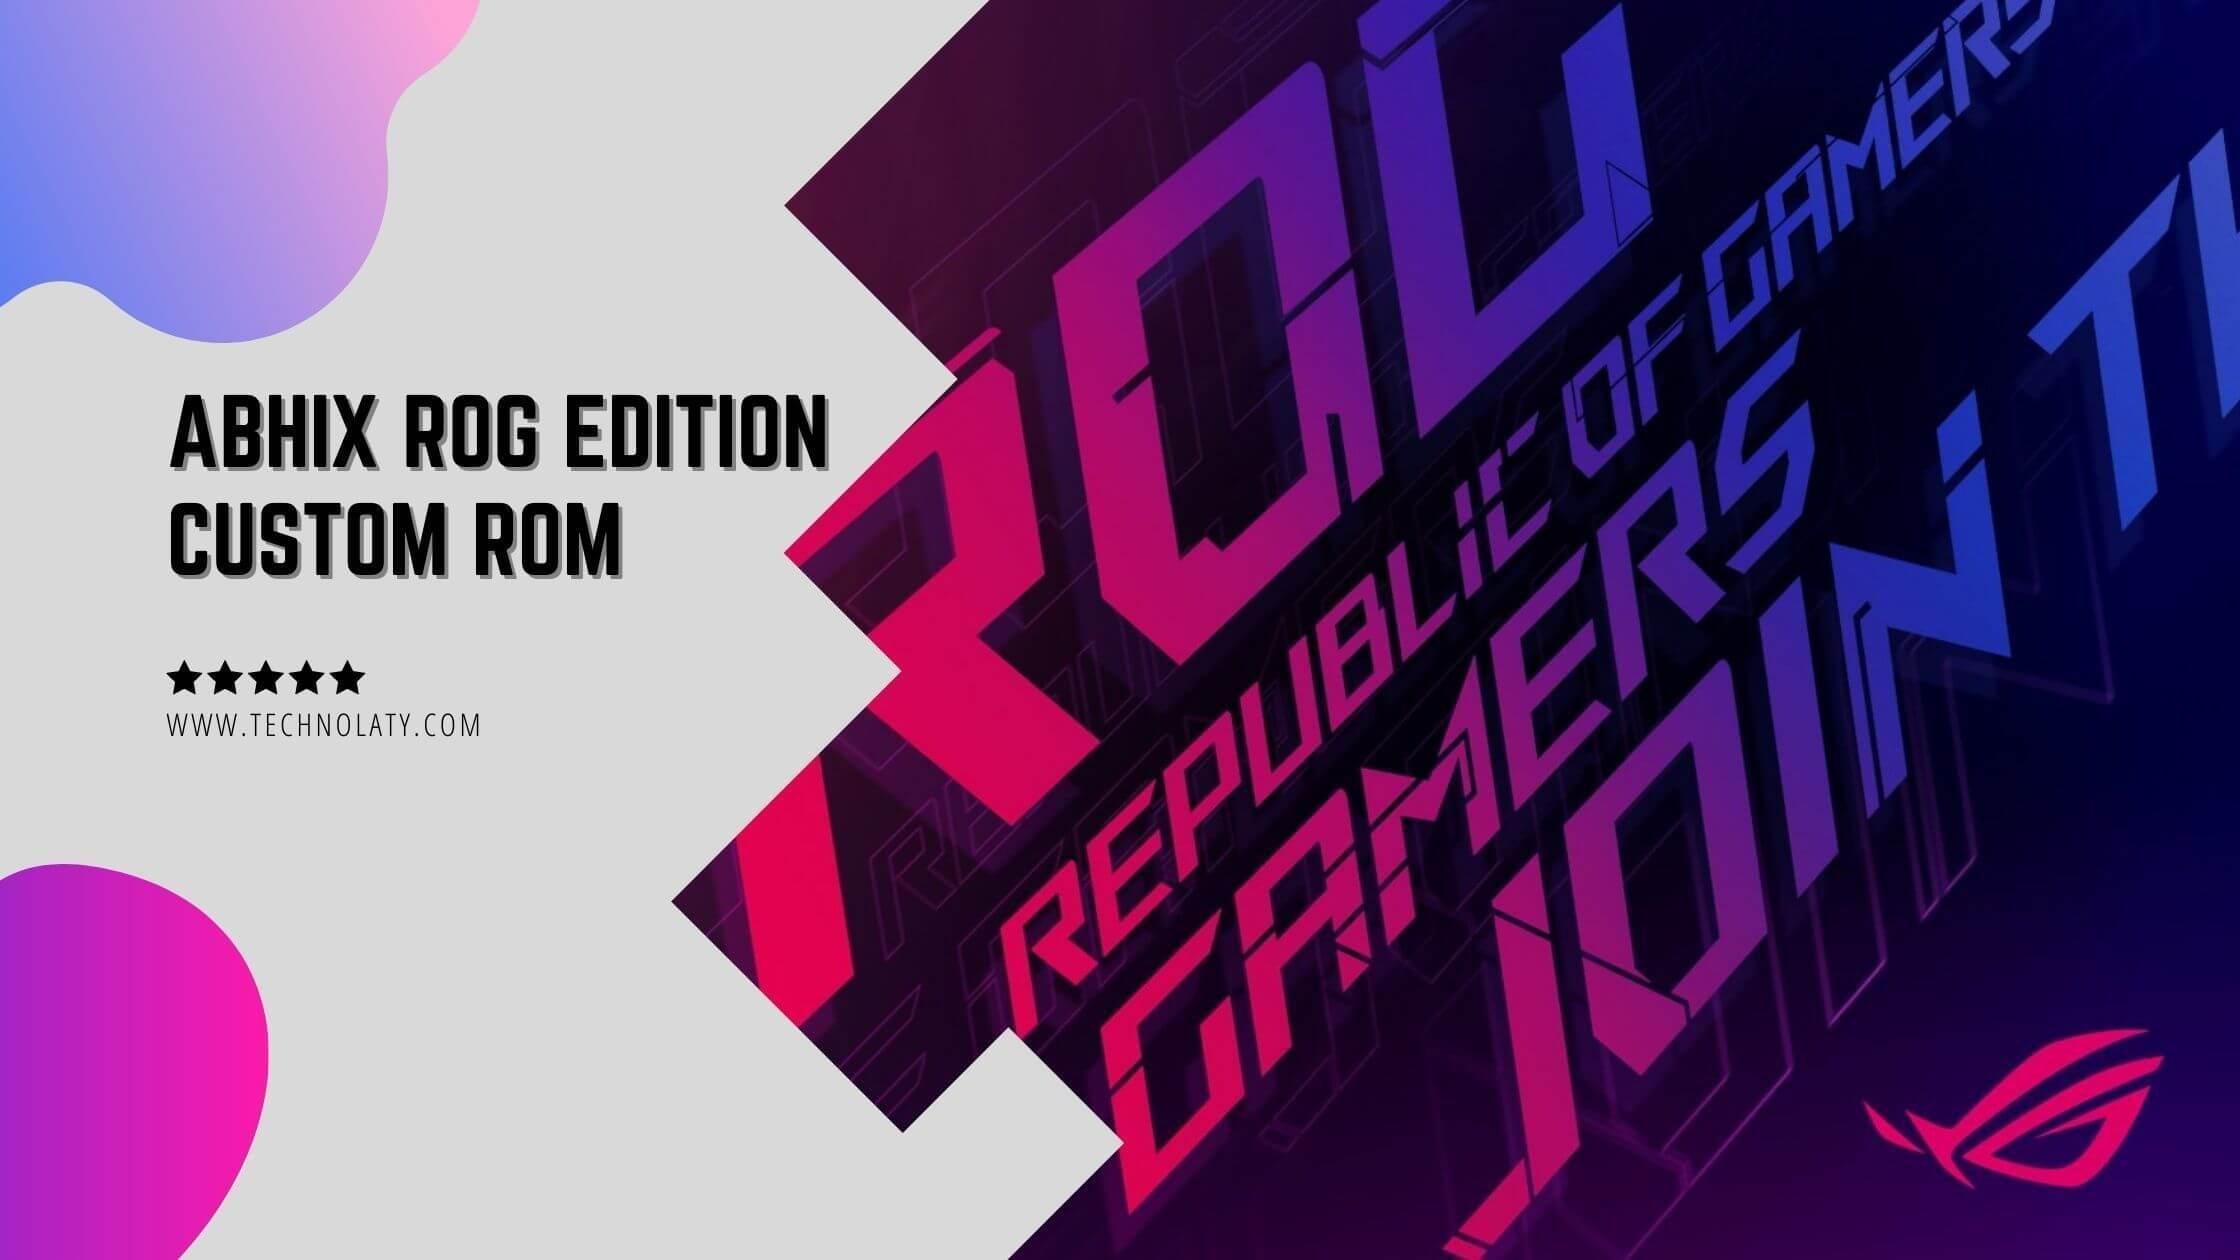 Download AbhiX ROG Edition custom ROM